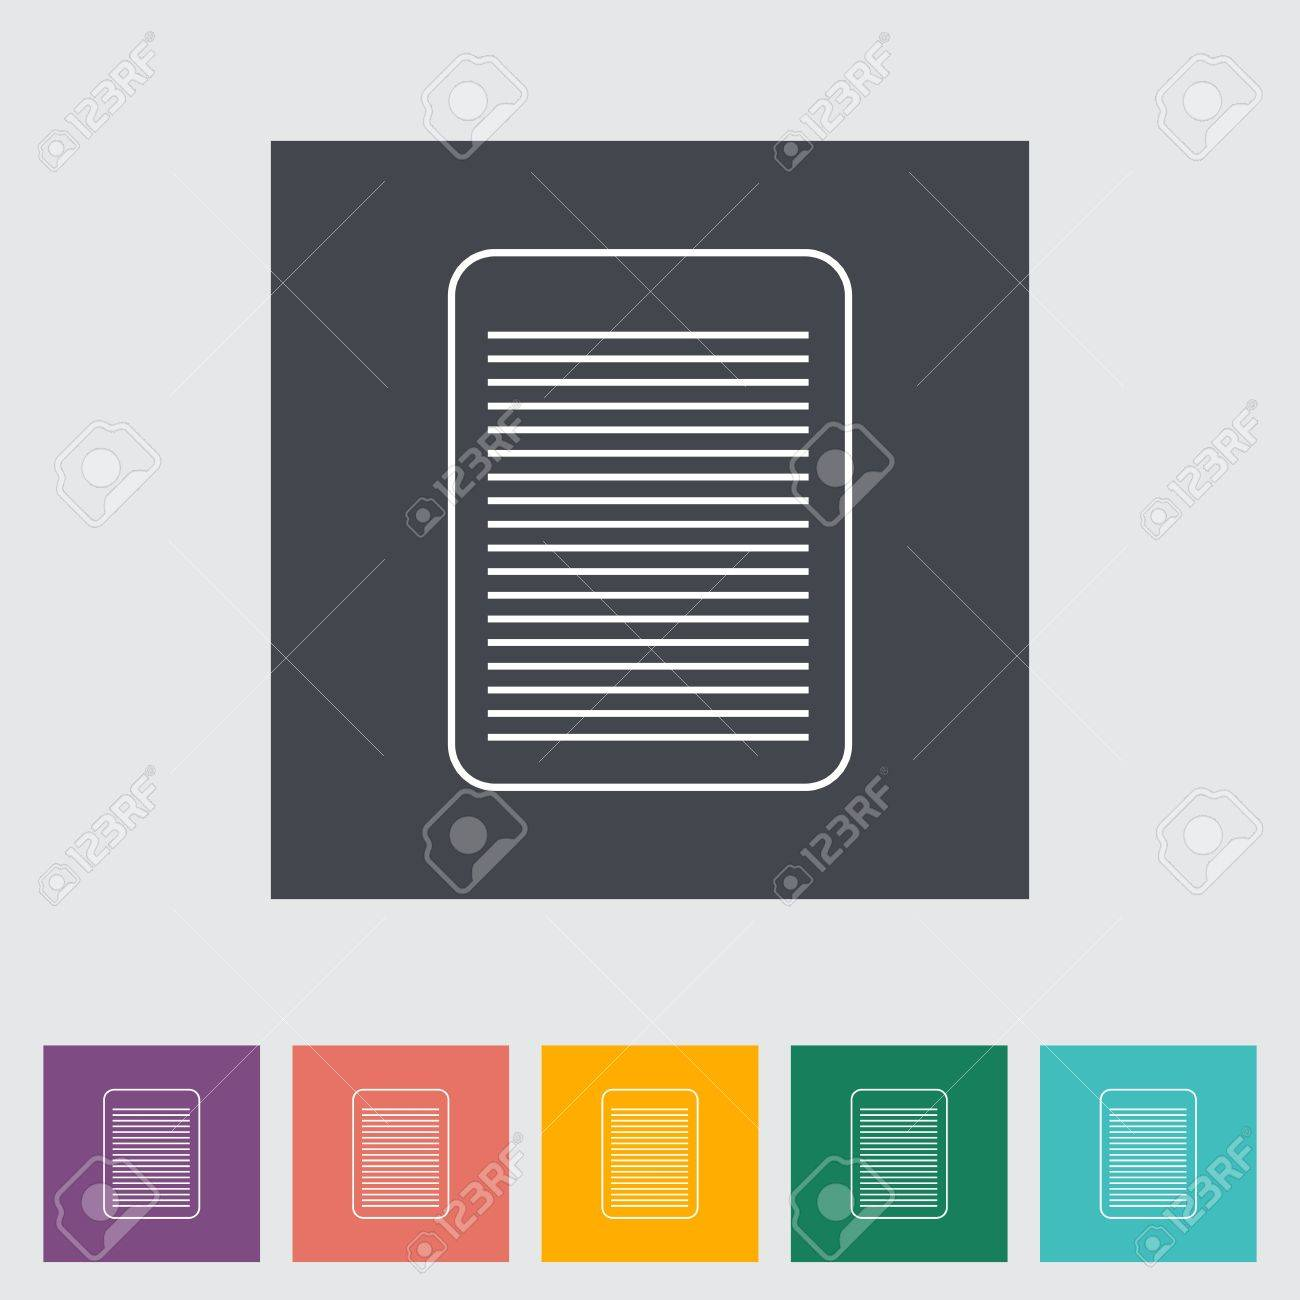 Document single flat icon. Vector illustration. Stock Vector - 21190430